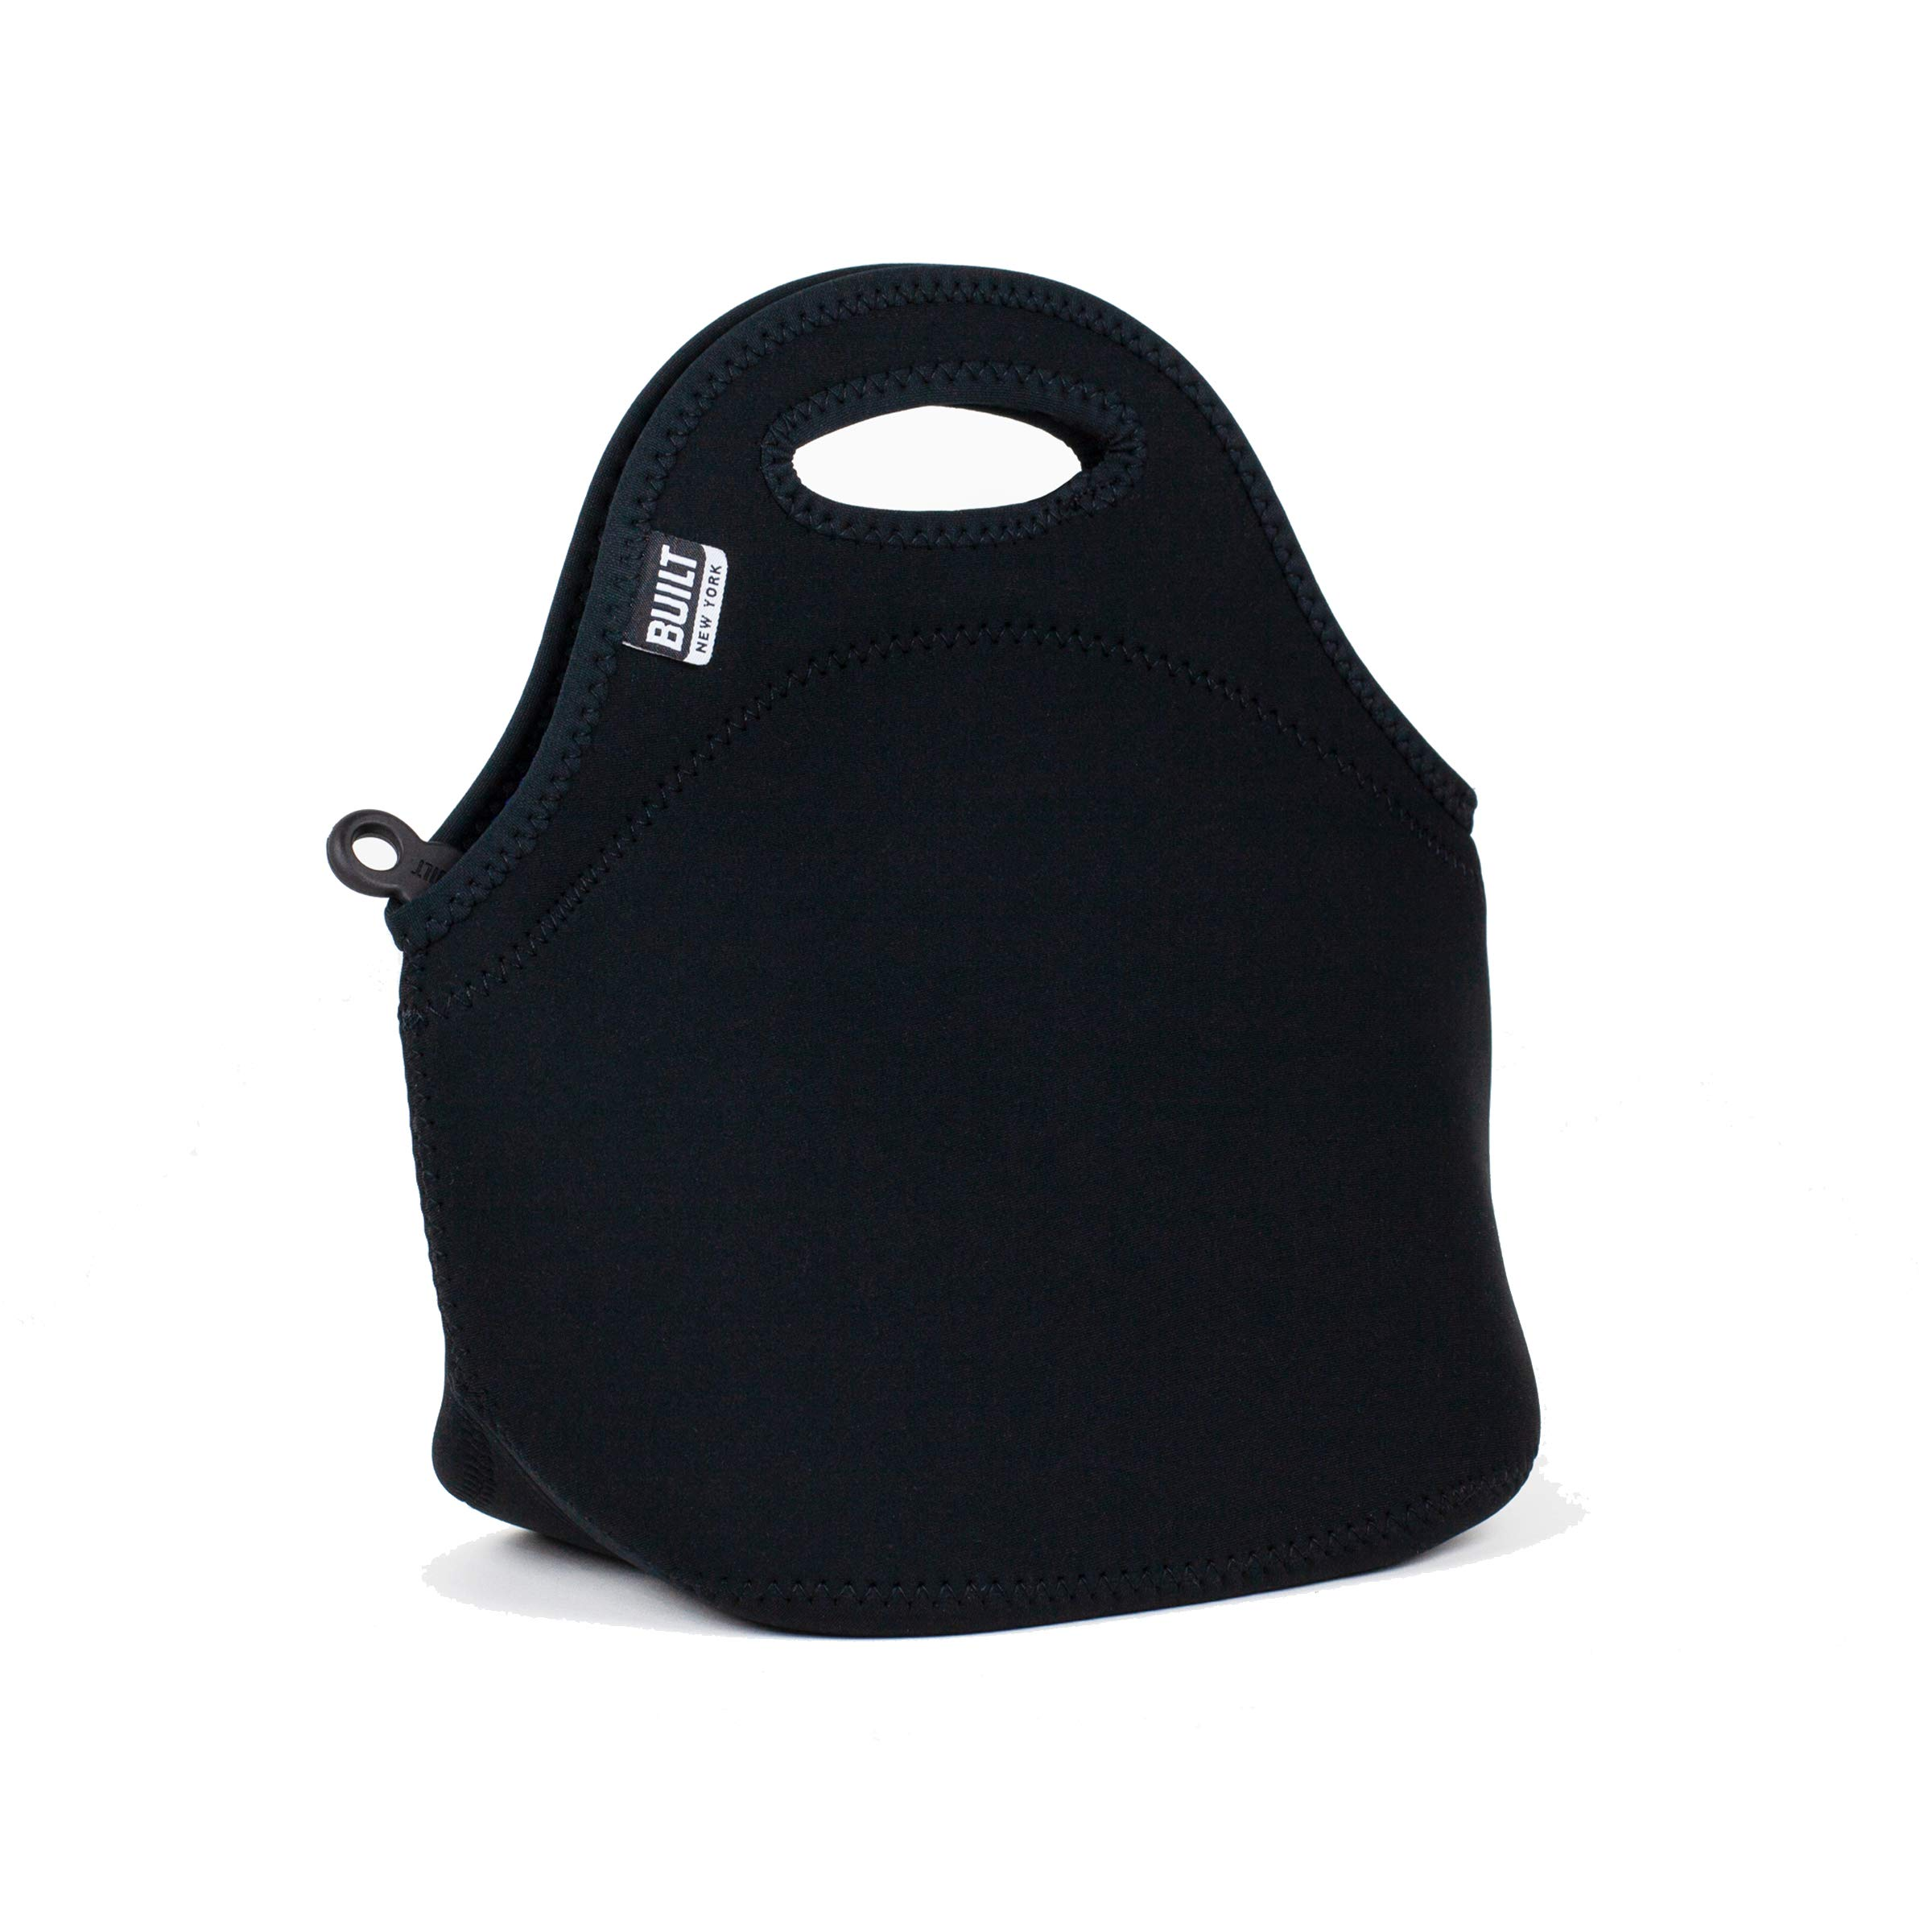 BUILT LB31-BLK Gourmet Getaway Soft Neoprene Lunch Tote Bag - Lightweight, Insulated and Reusable, Black